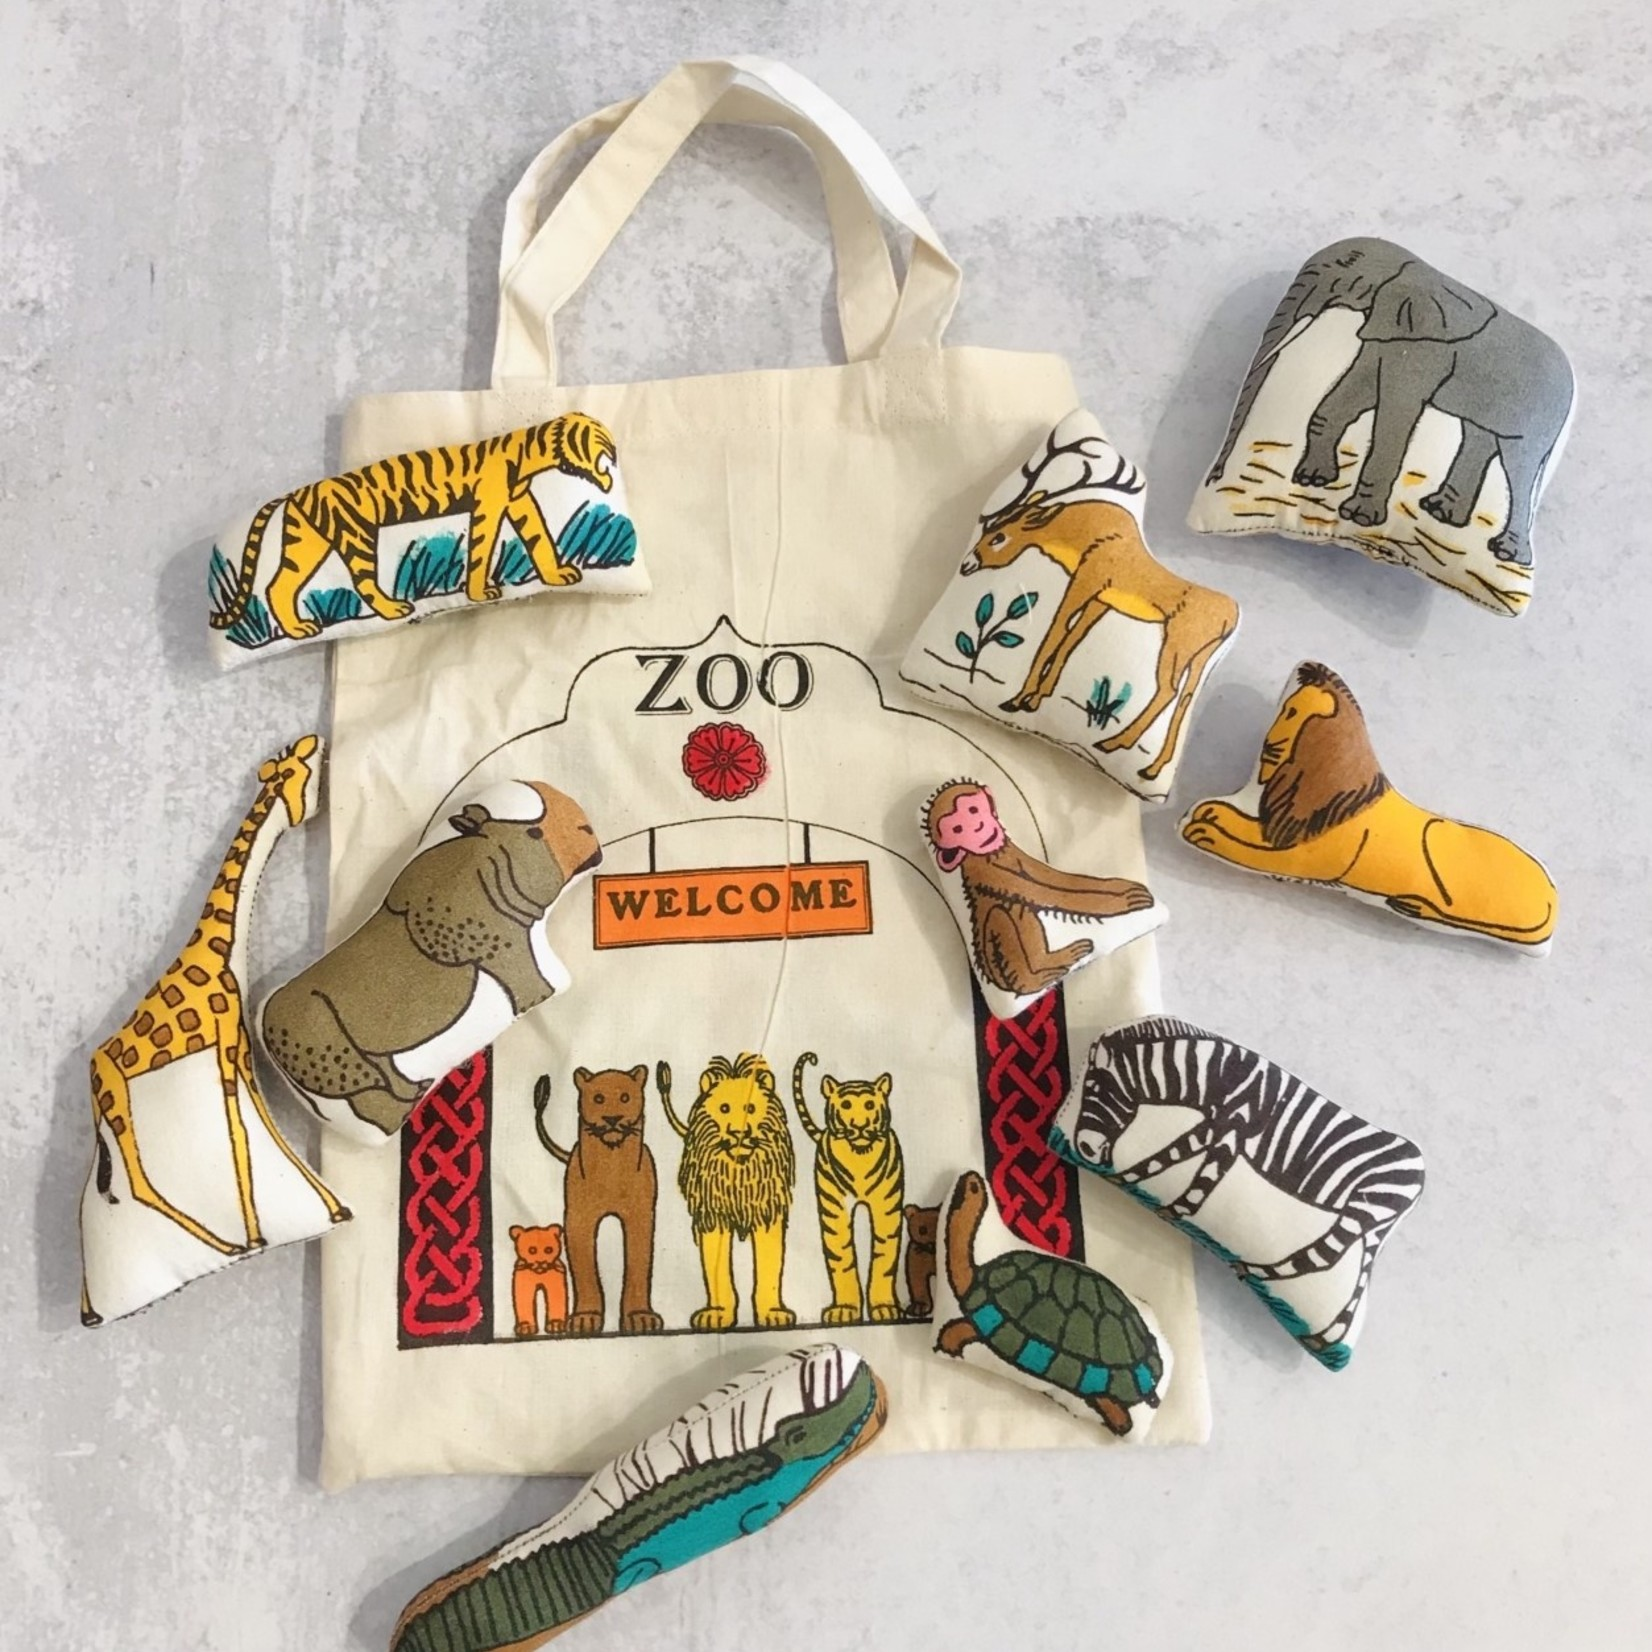 Market Stuffed Toys-Trip To The Zoo